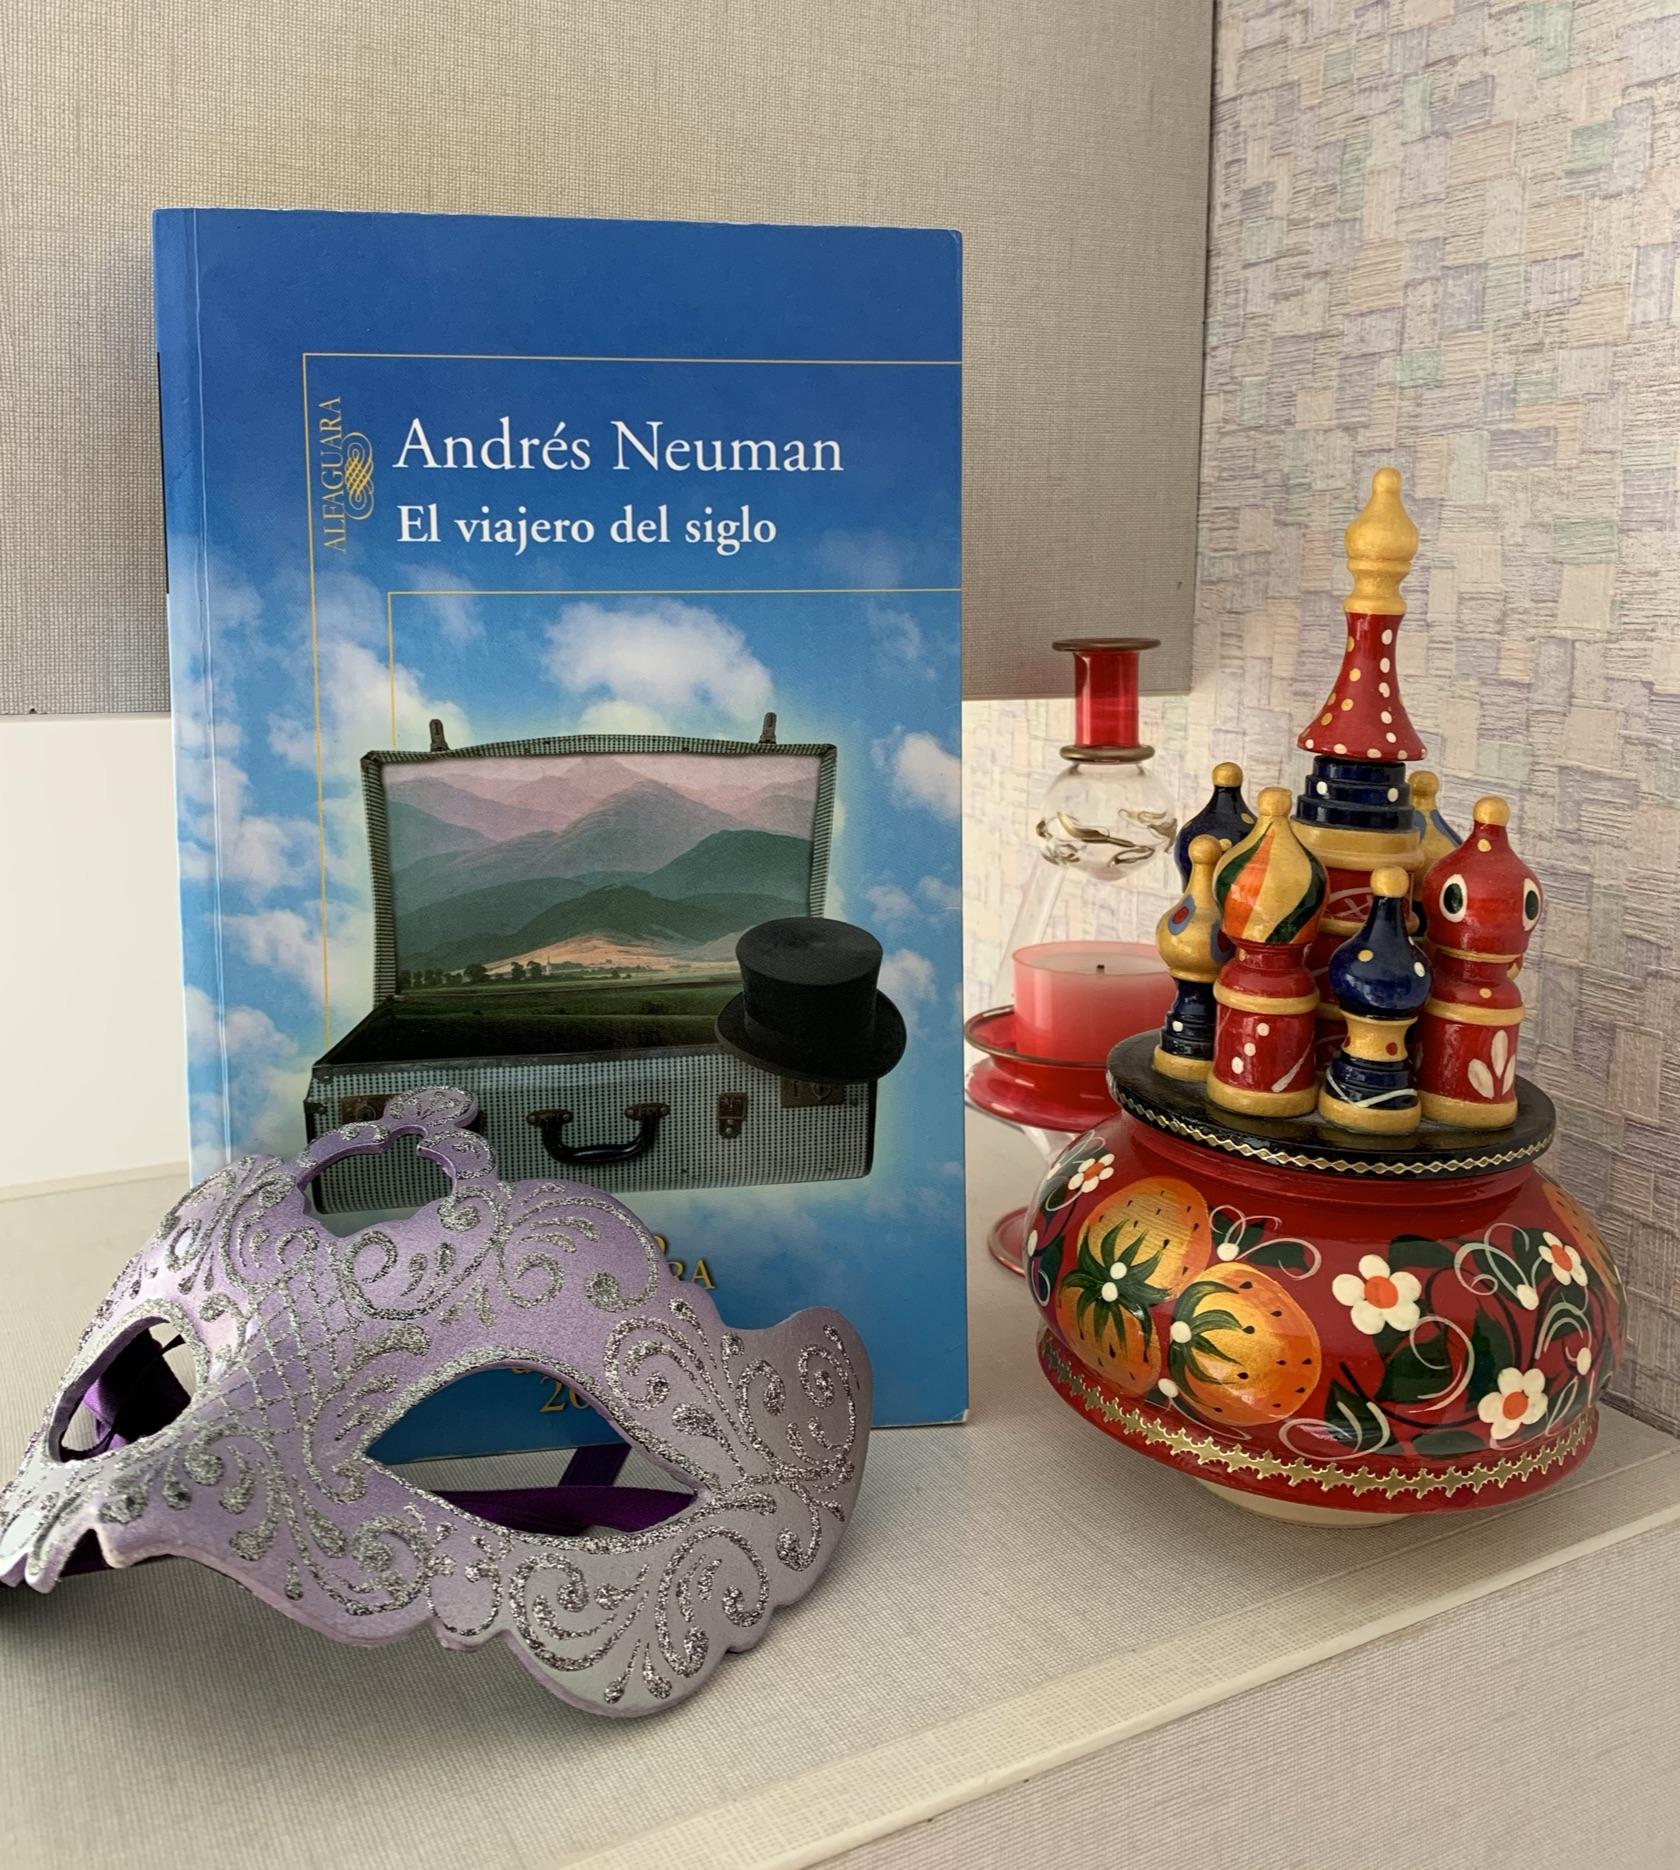 Libro El viajero del siglo de Andrés Neuman